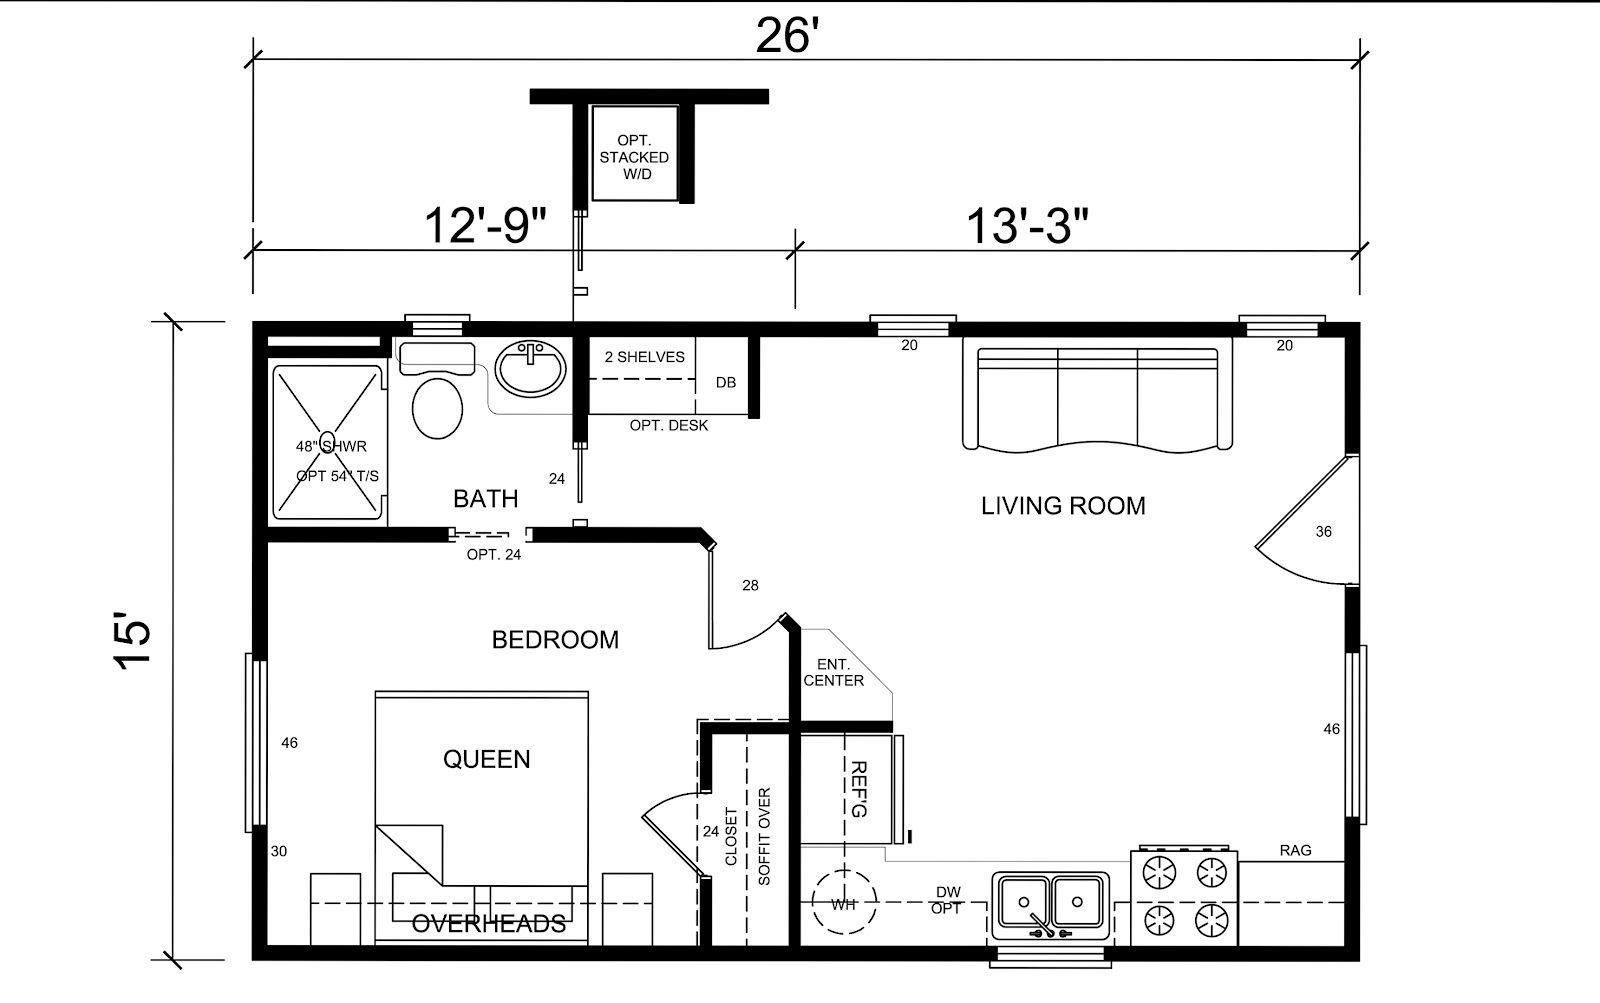 Shed Plans 12x16 Tinyhousecommunity Tiny House Floor Plans Guest House Plans Pool House Plans